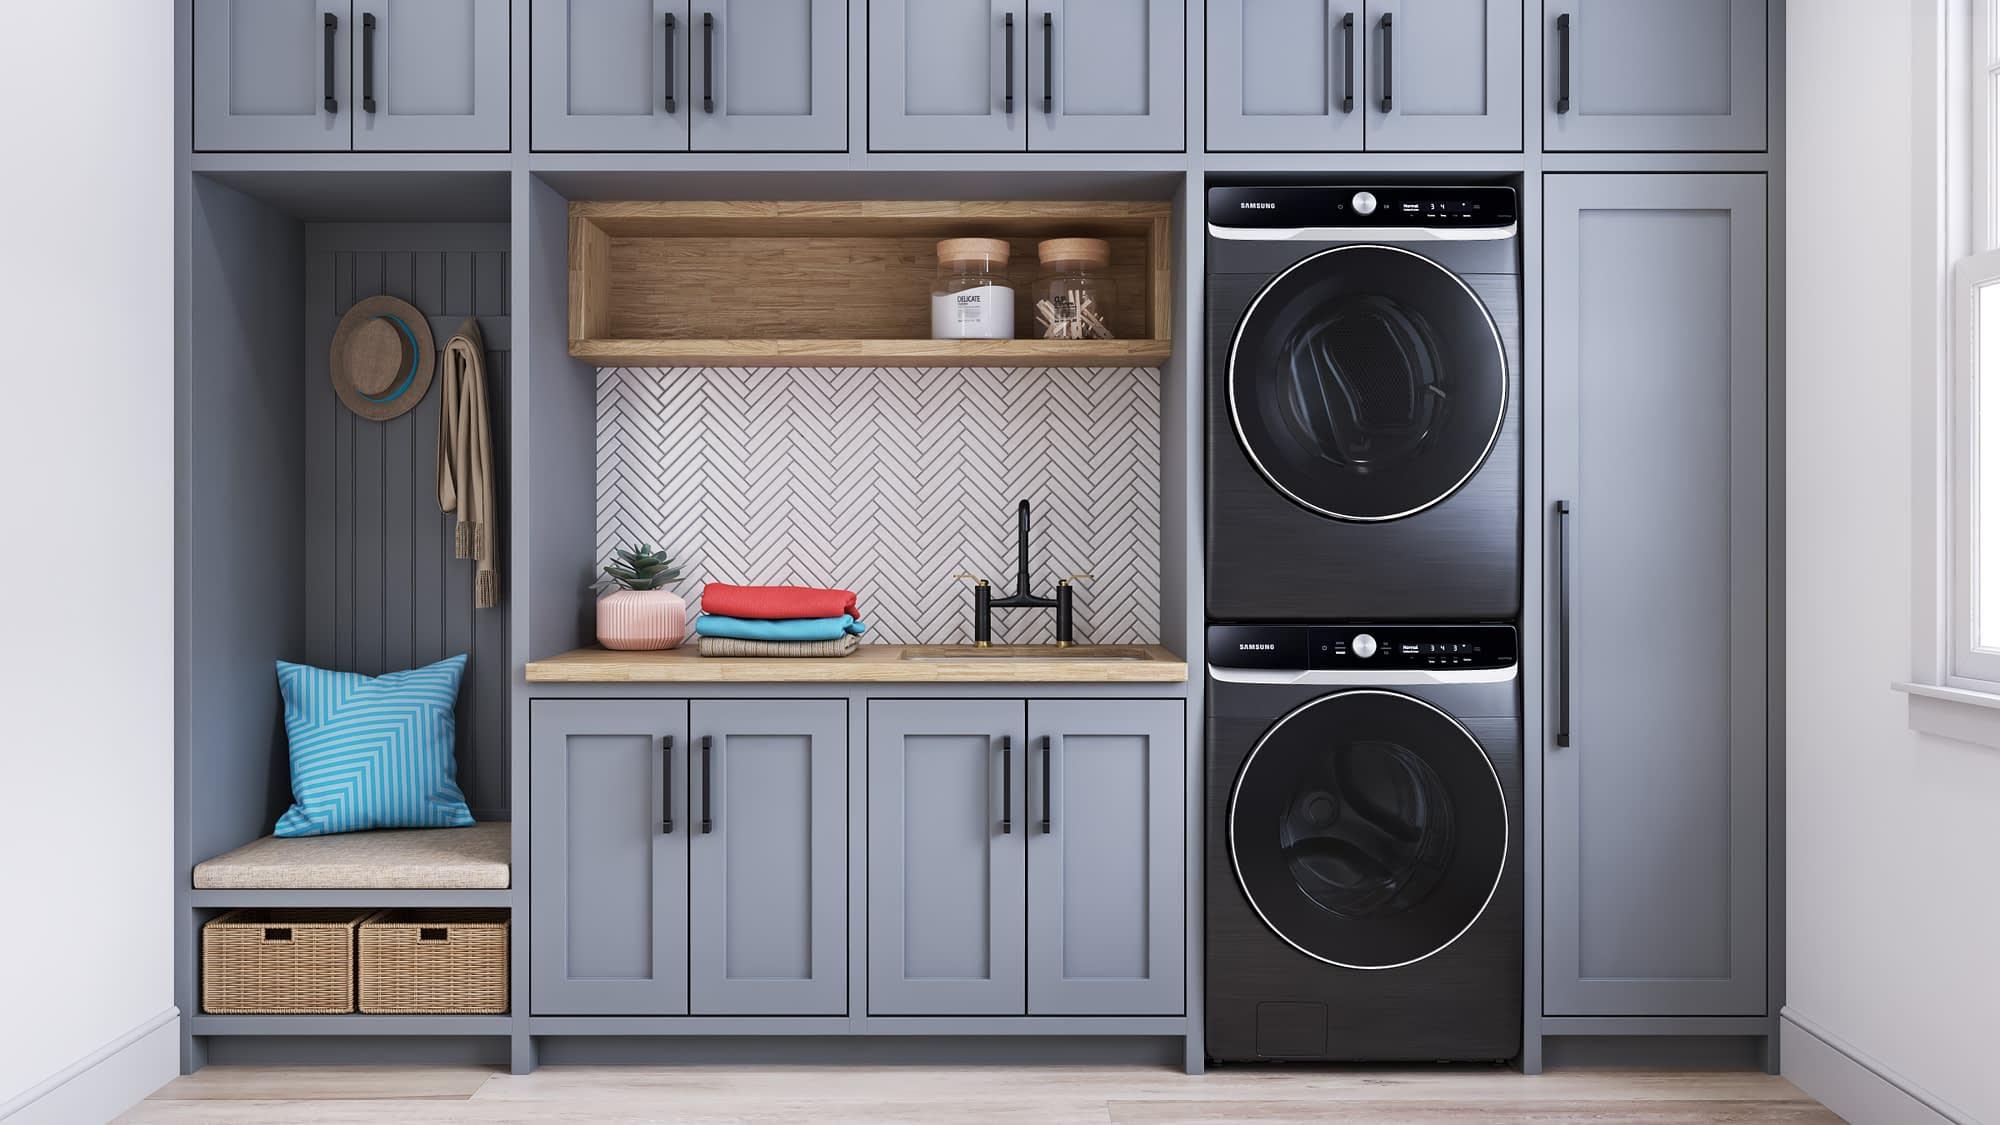 Samsung washer dryer 3D renderings